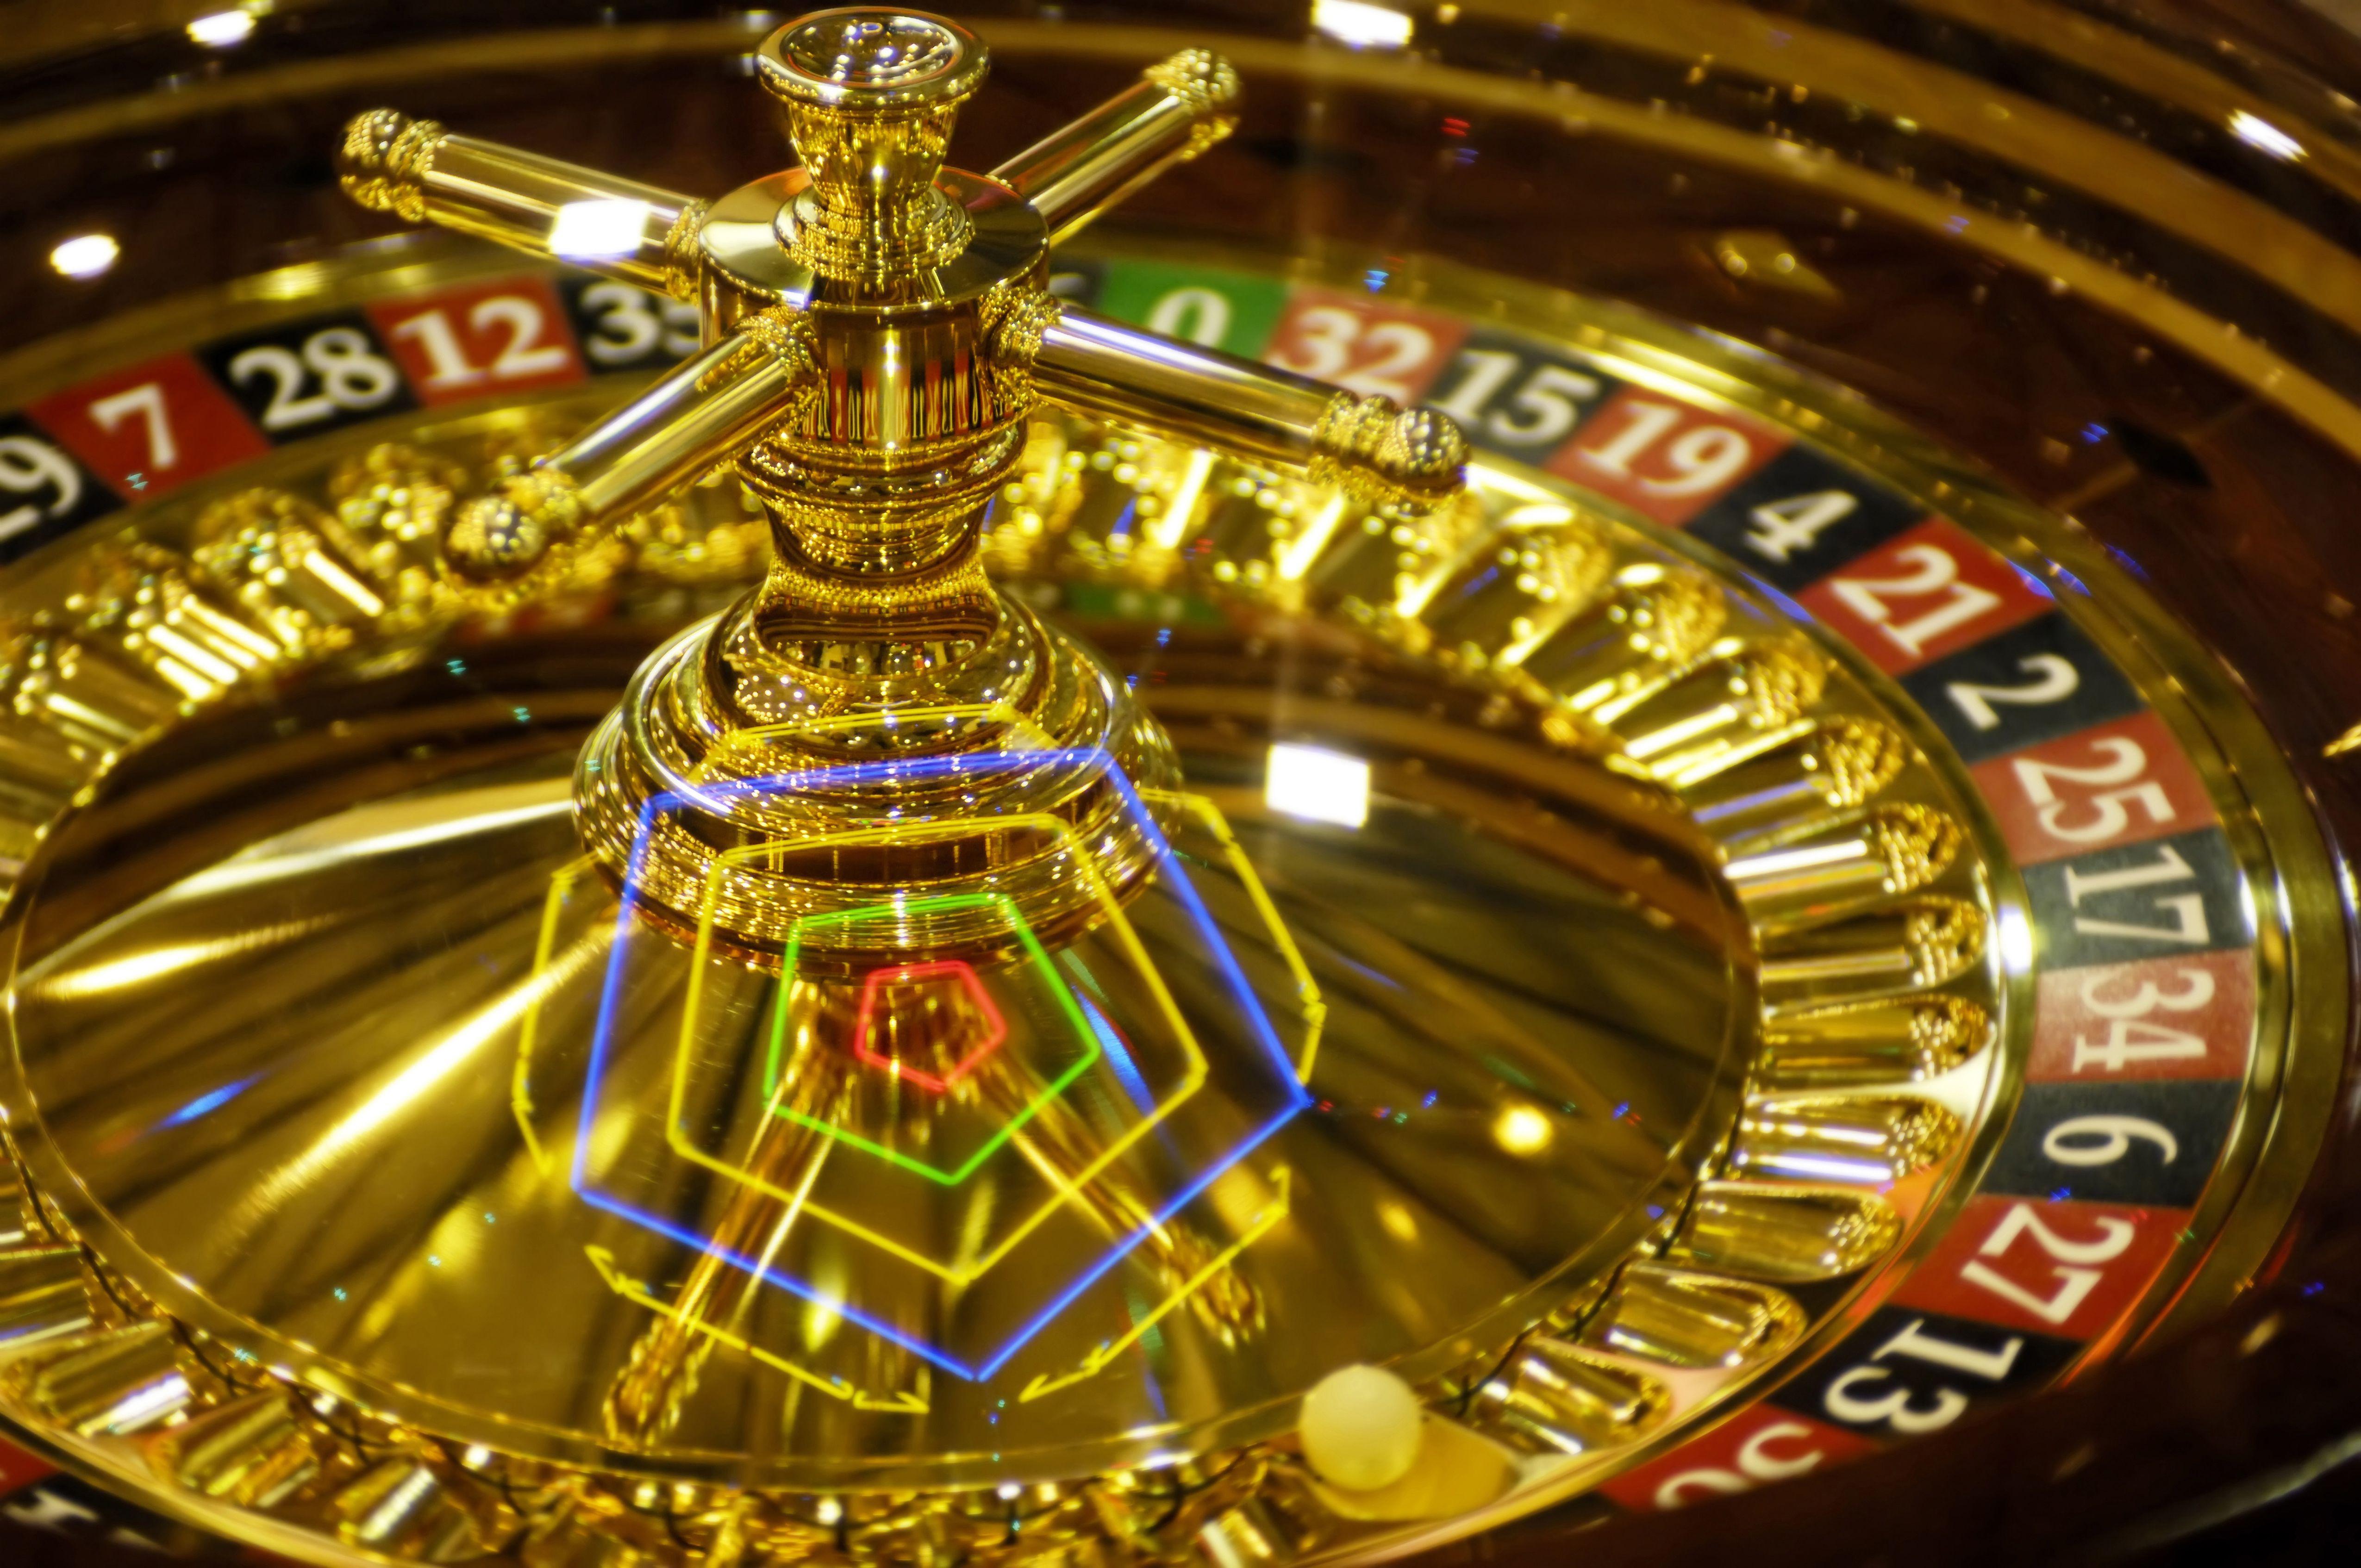 jackpot fortune casino slots apk